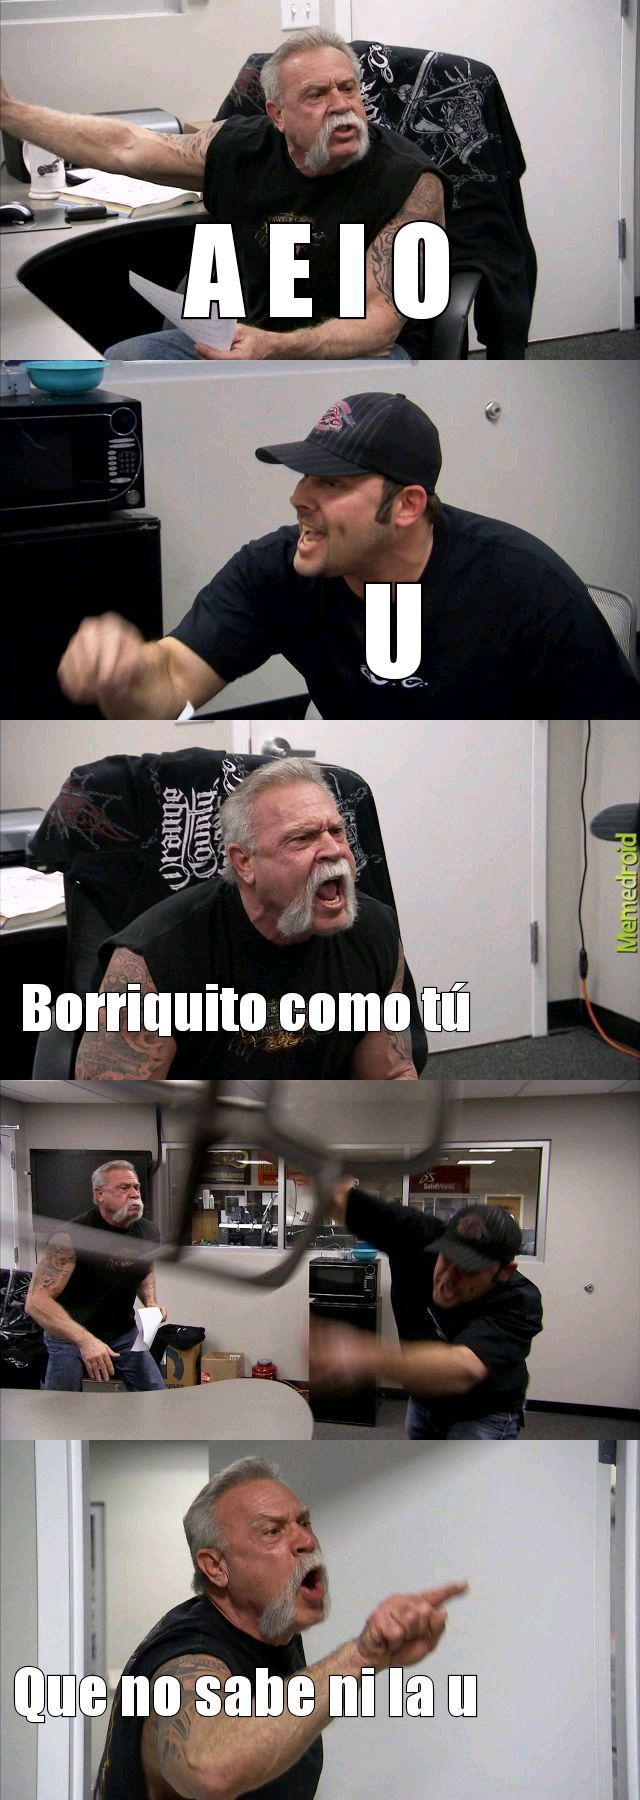 como odiaba eso - meme